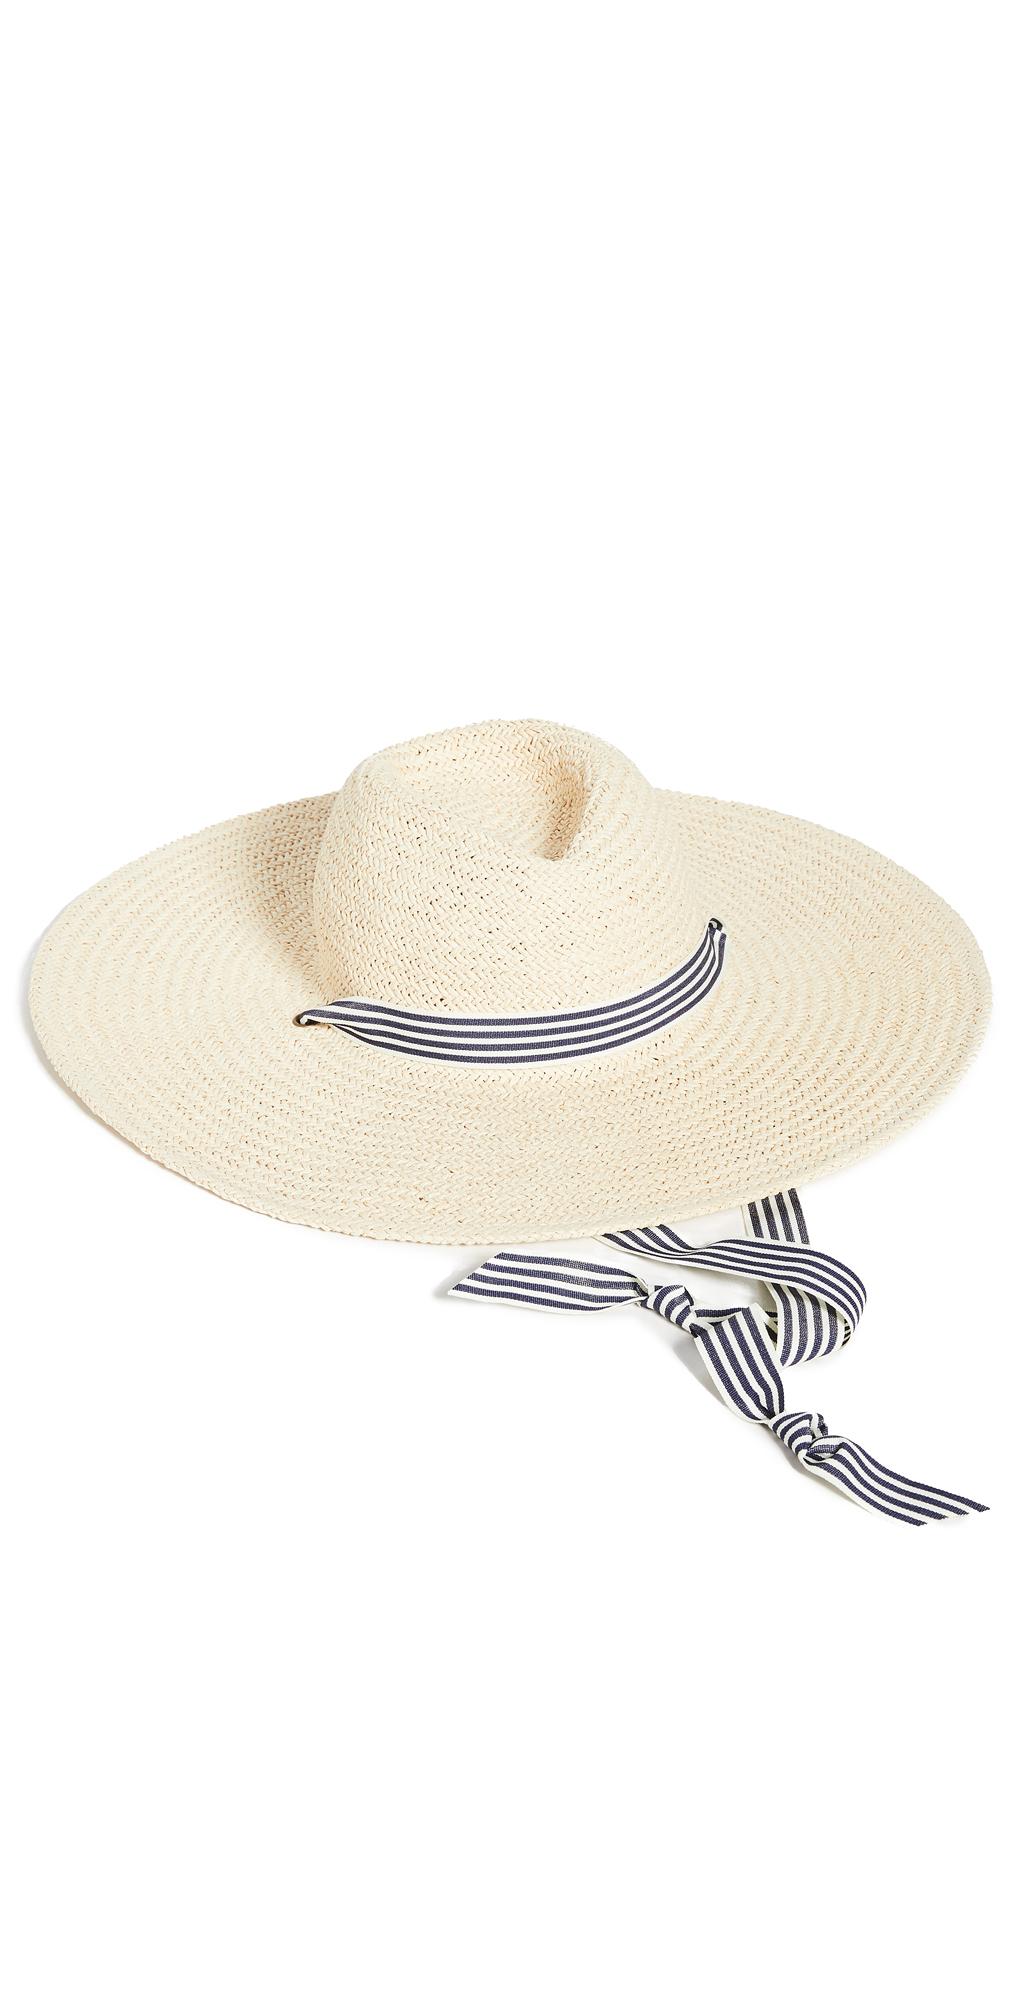 Belle Chinstrap Hat